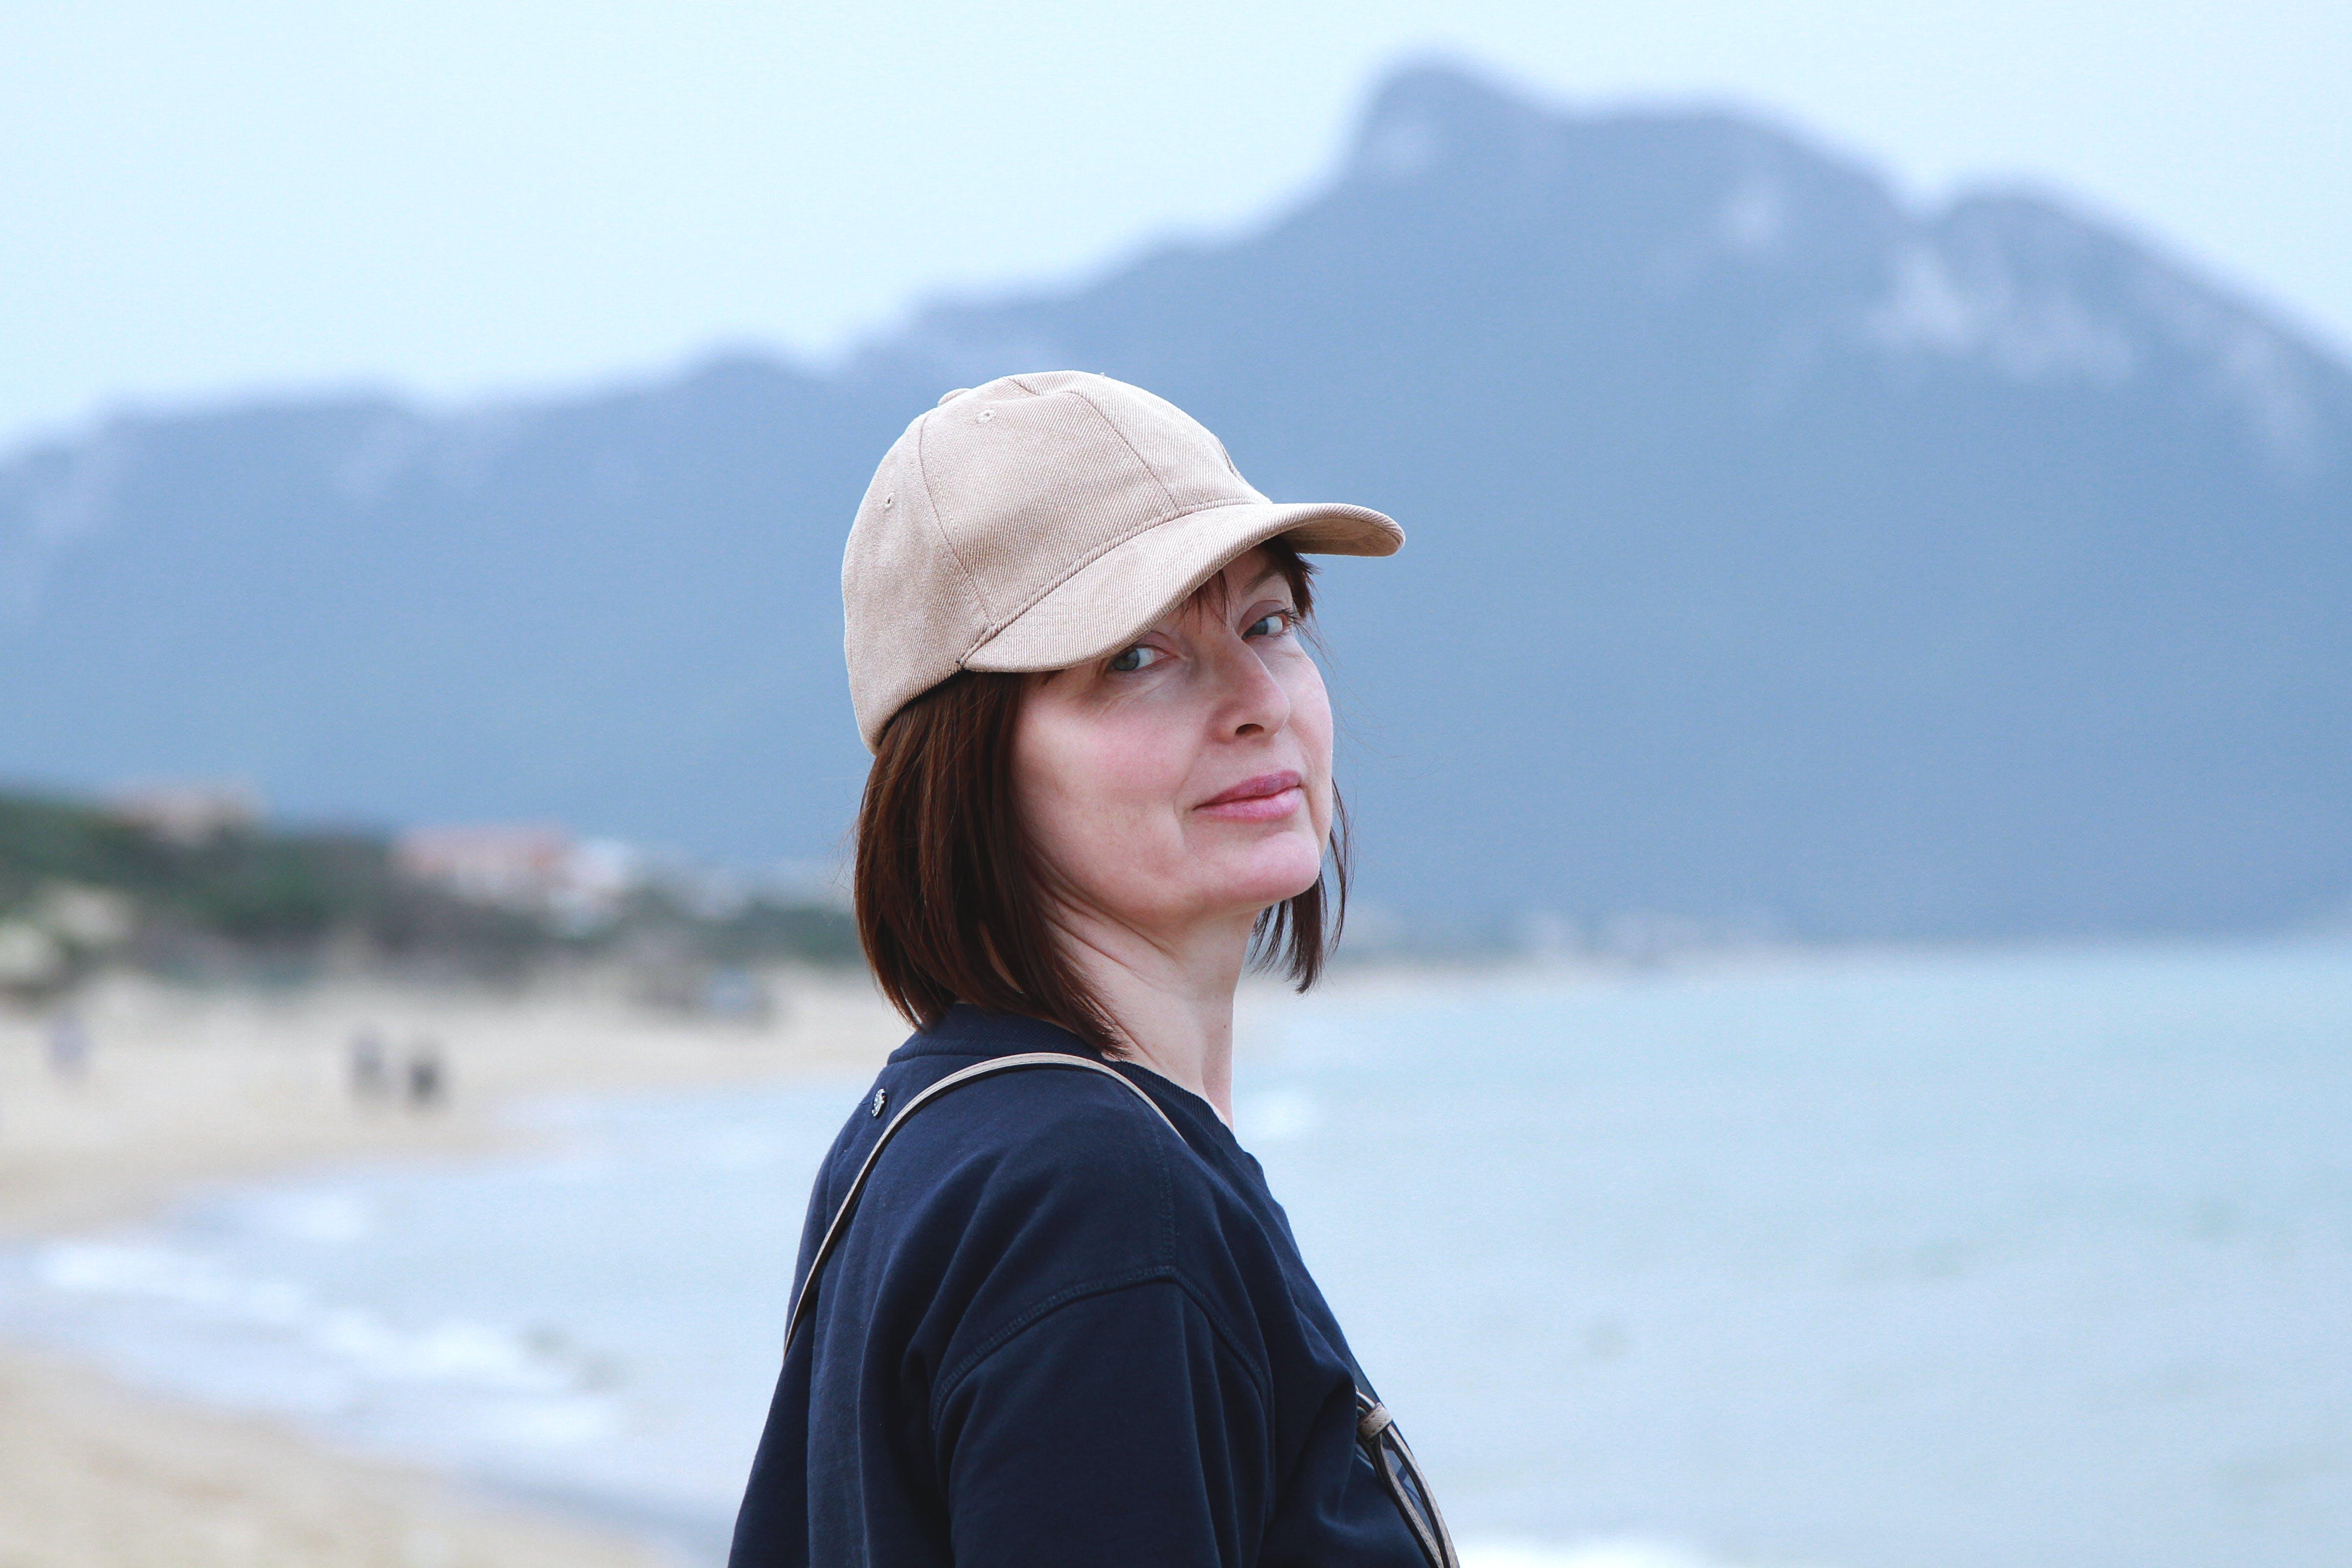 Woman Wearing Cap on Seashore Near Mountain